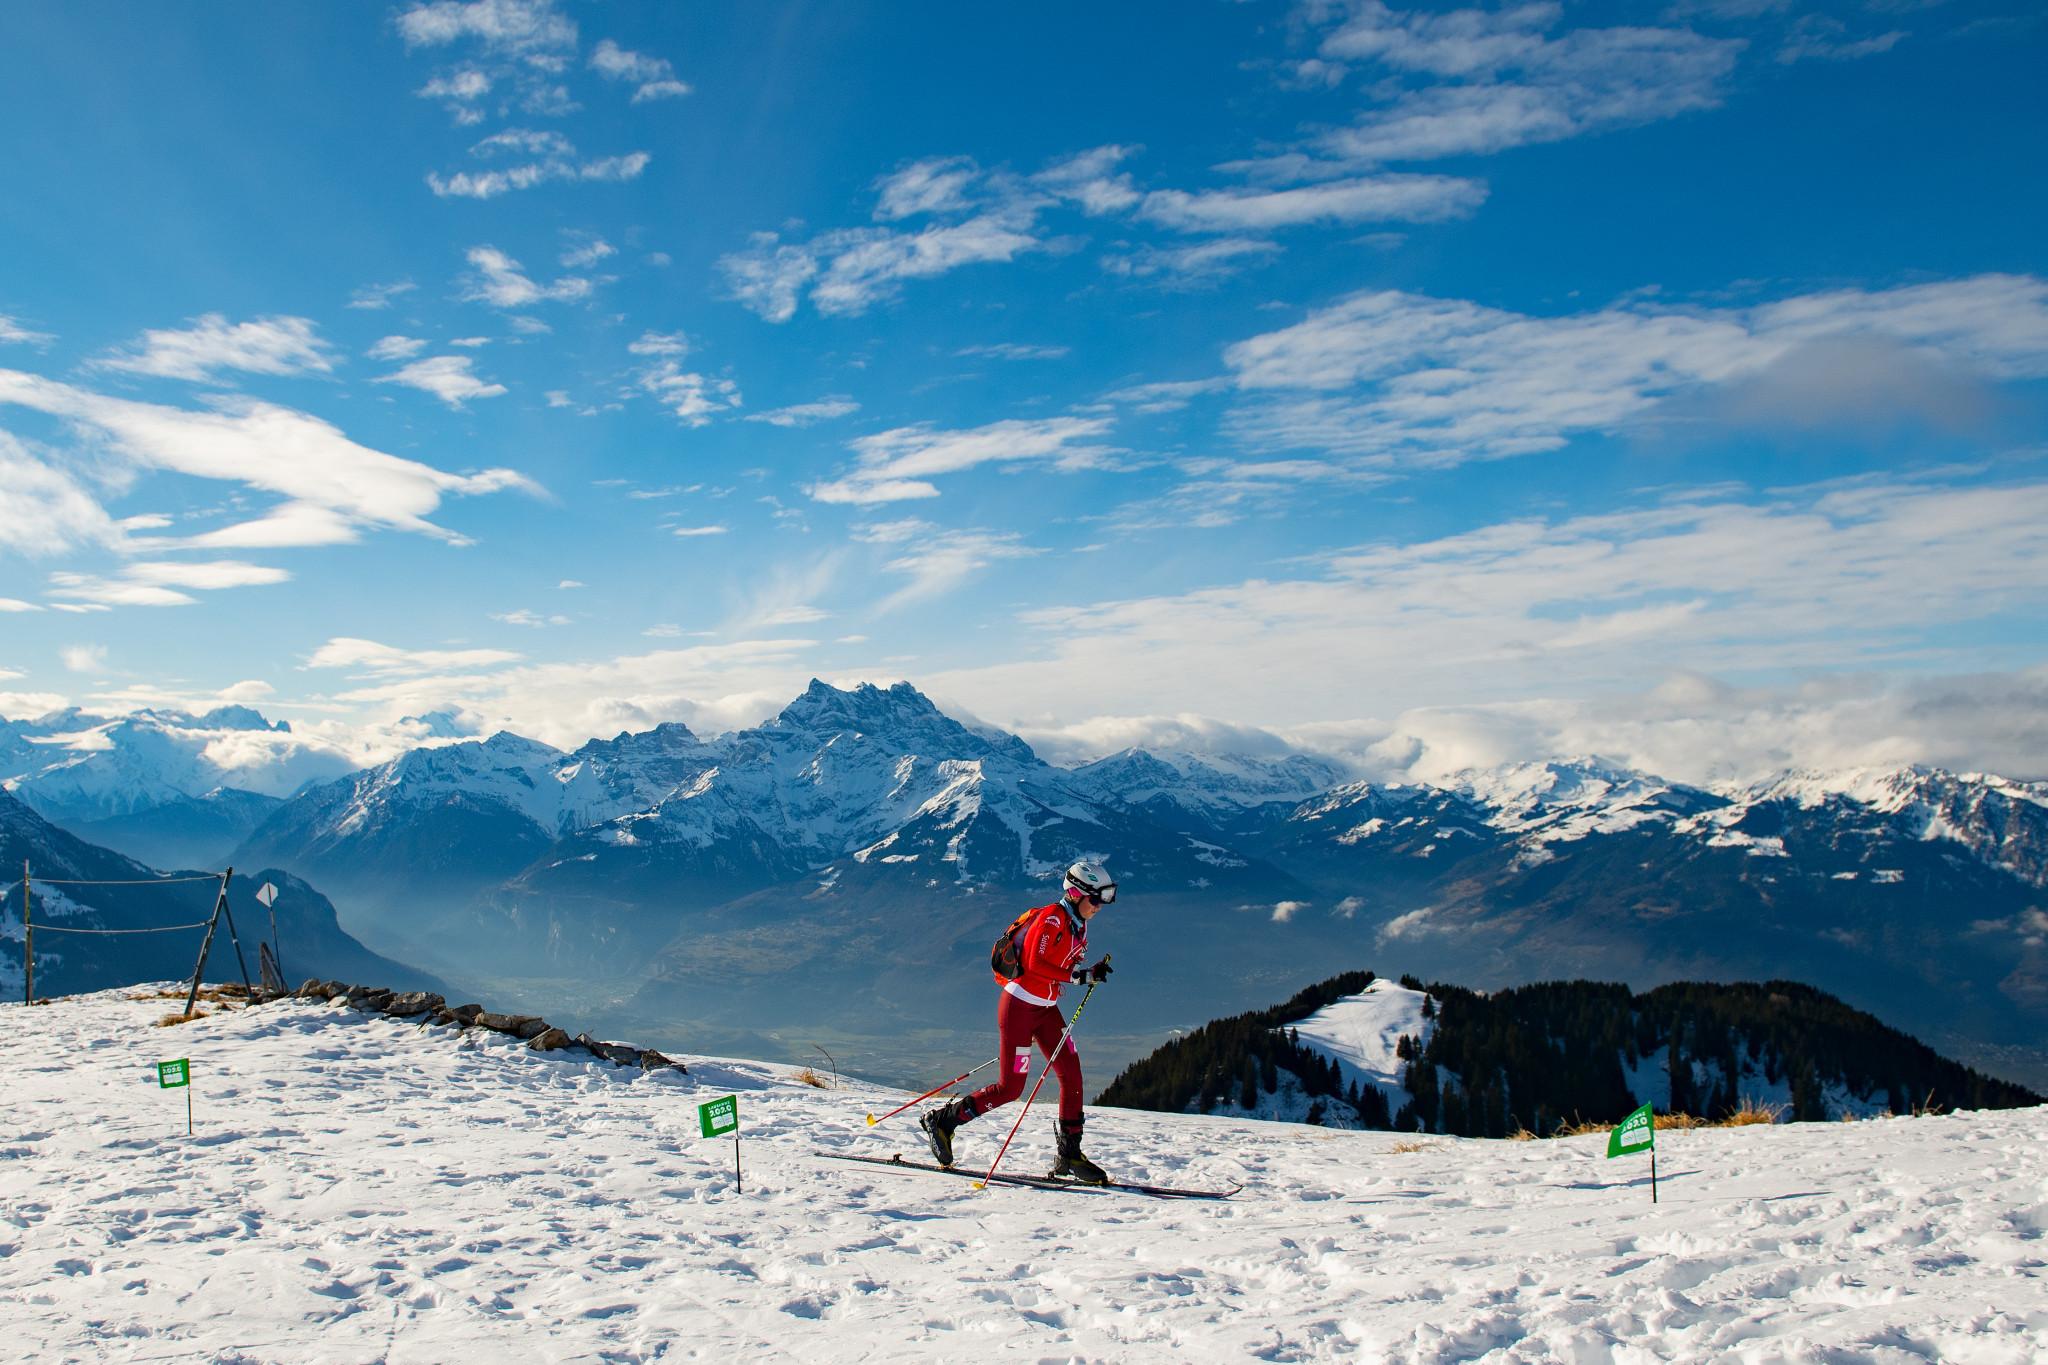 Ski mountaineering set to be added to Milan Cortina 2026 programme